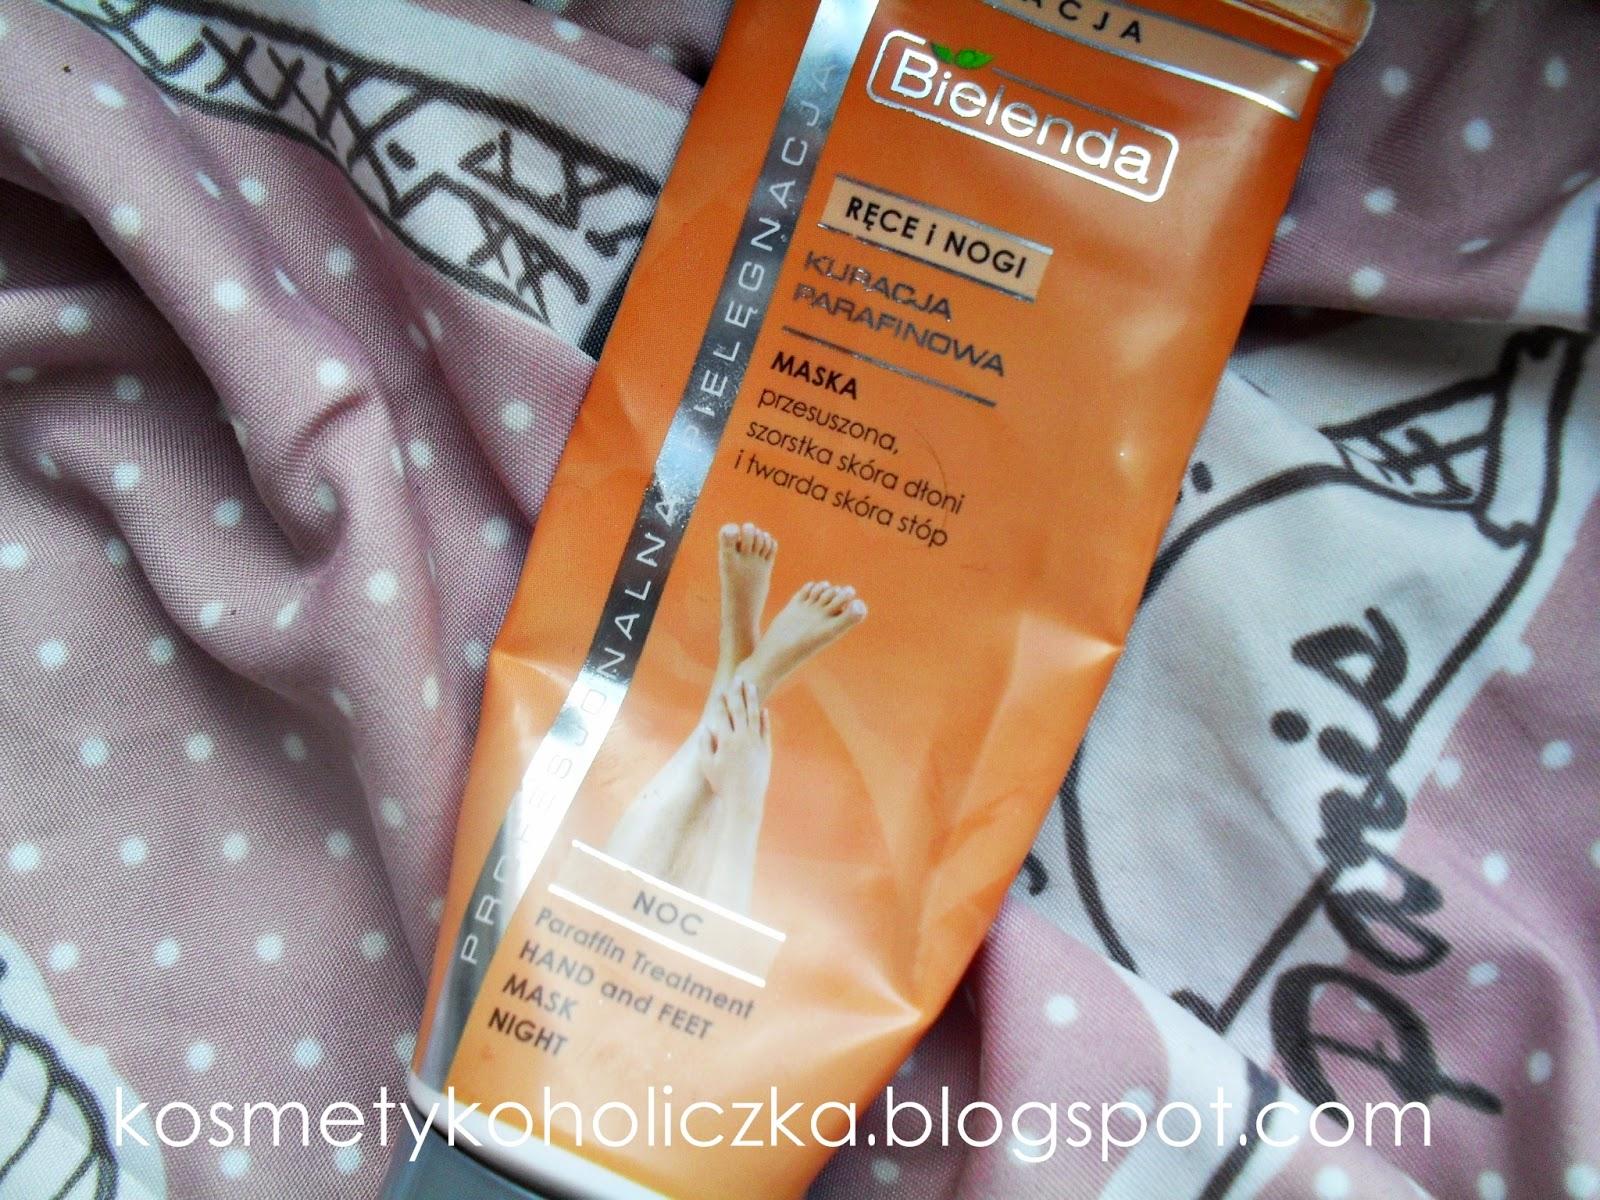 O produktach do stóp   Maska Bielenda   Peeling Paloma   Mocznik e-naturalne.pl